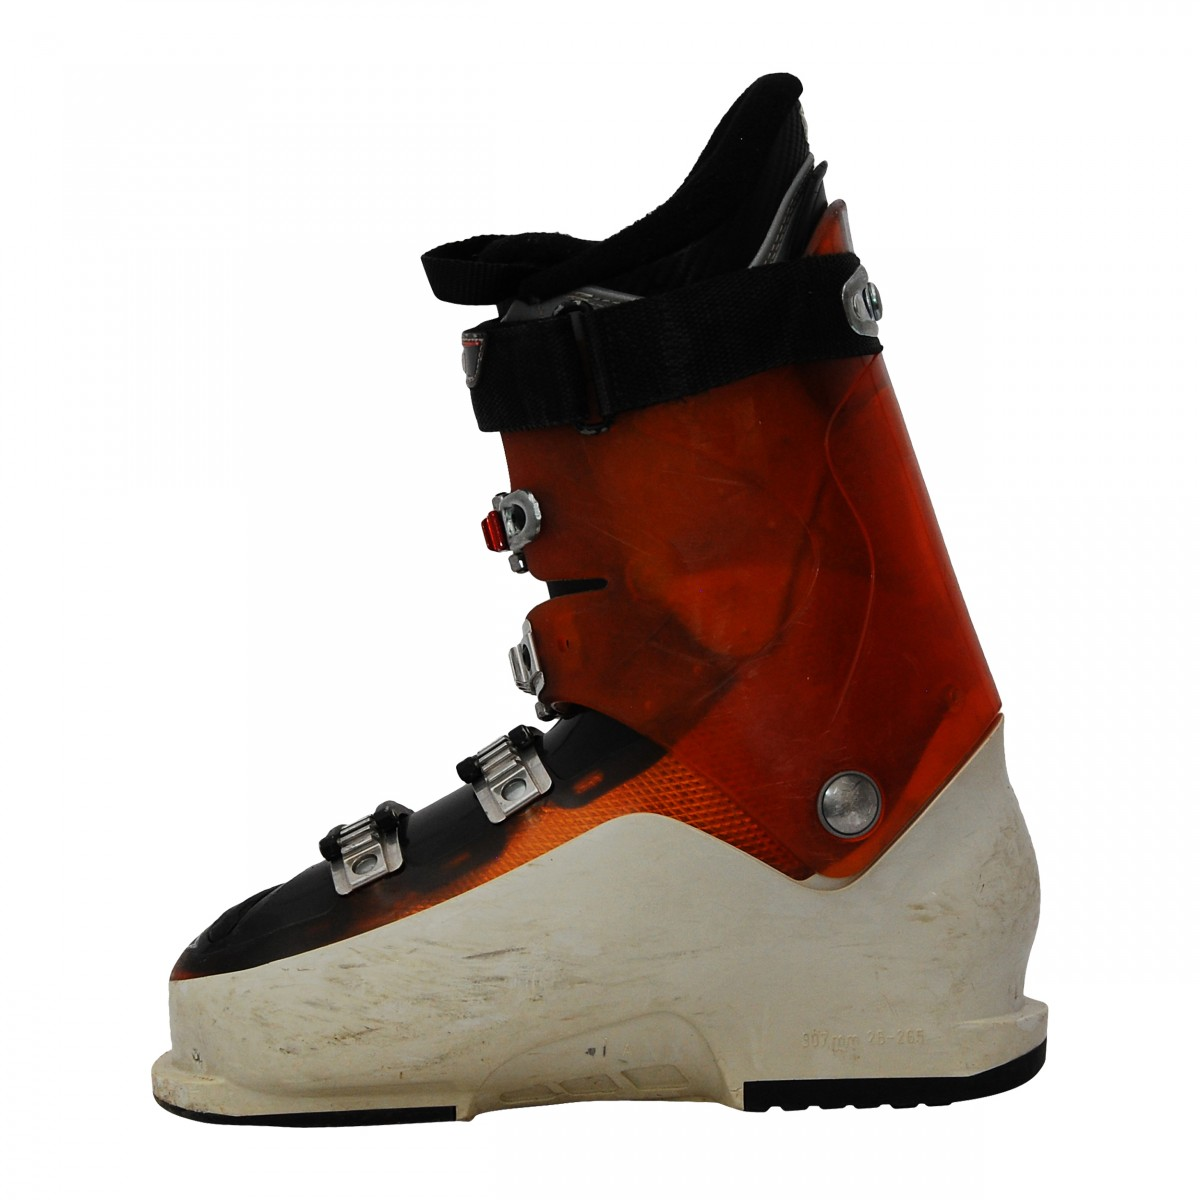 Chaussure de ski occasion Salomon Impact 880 blancorange